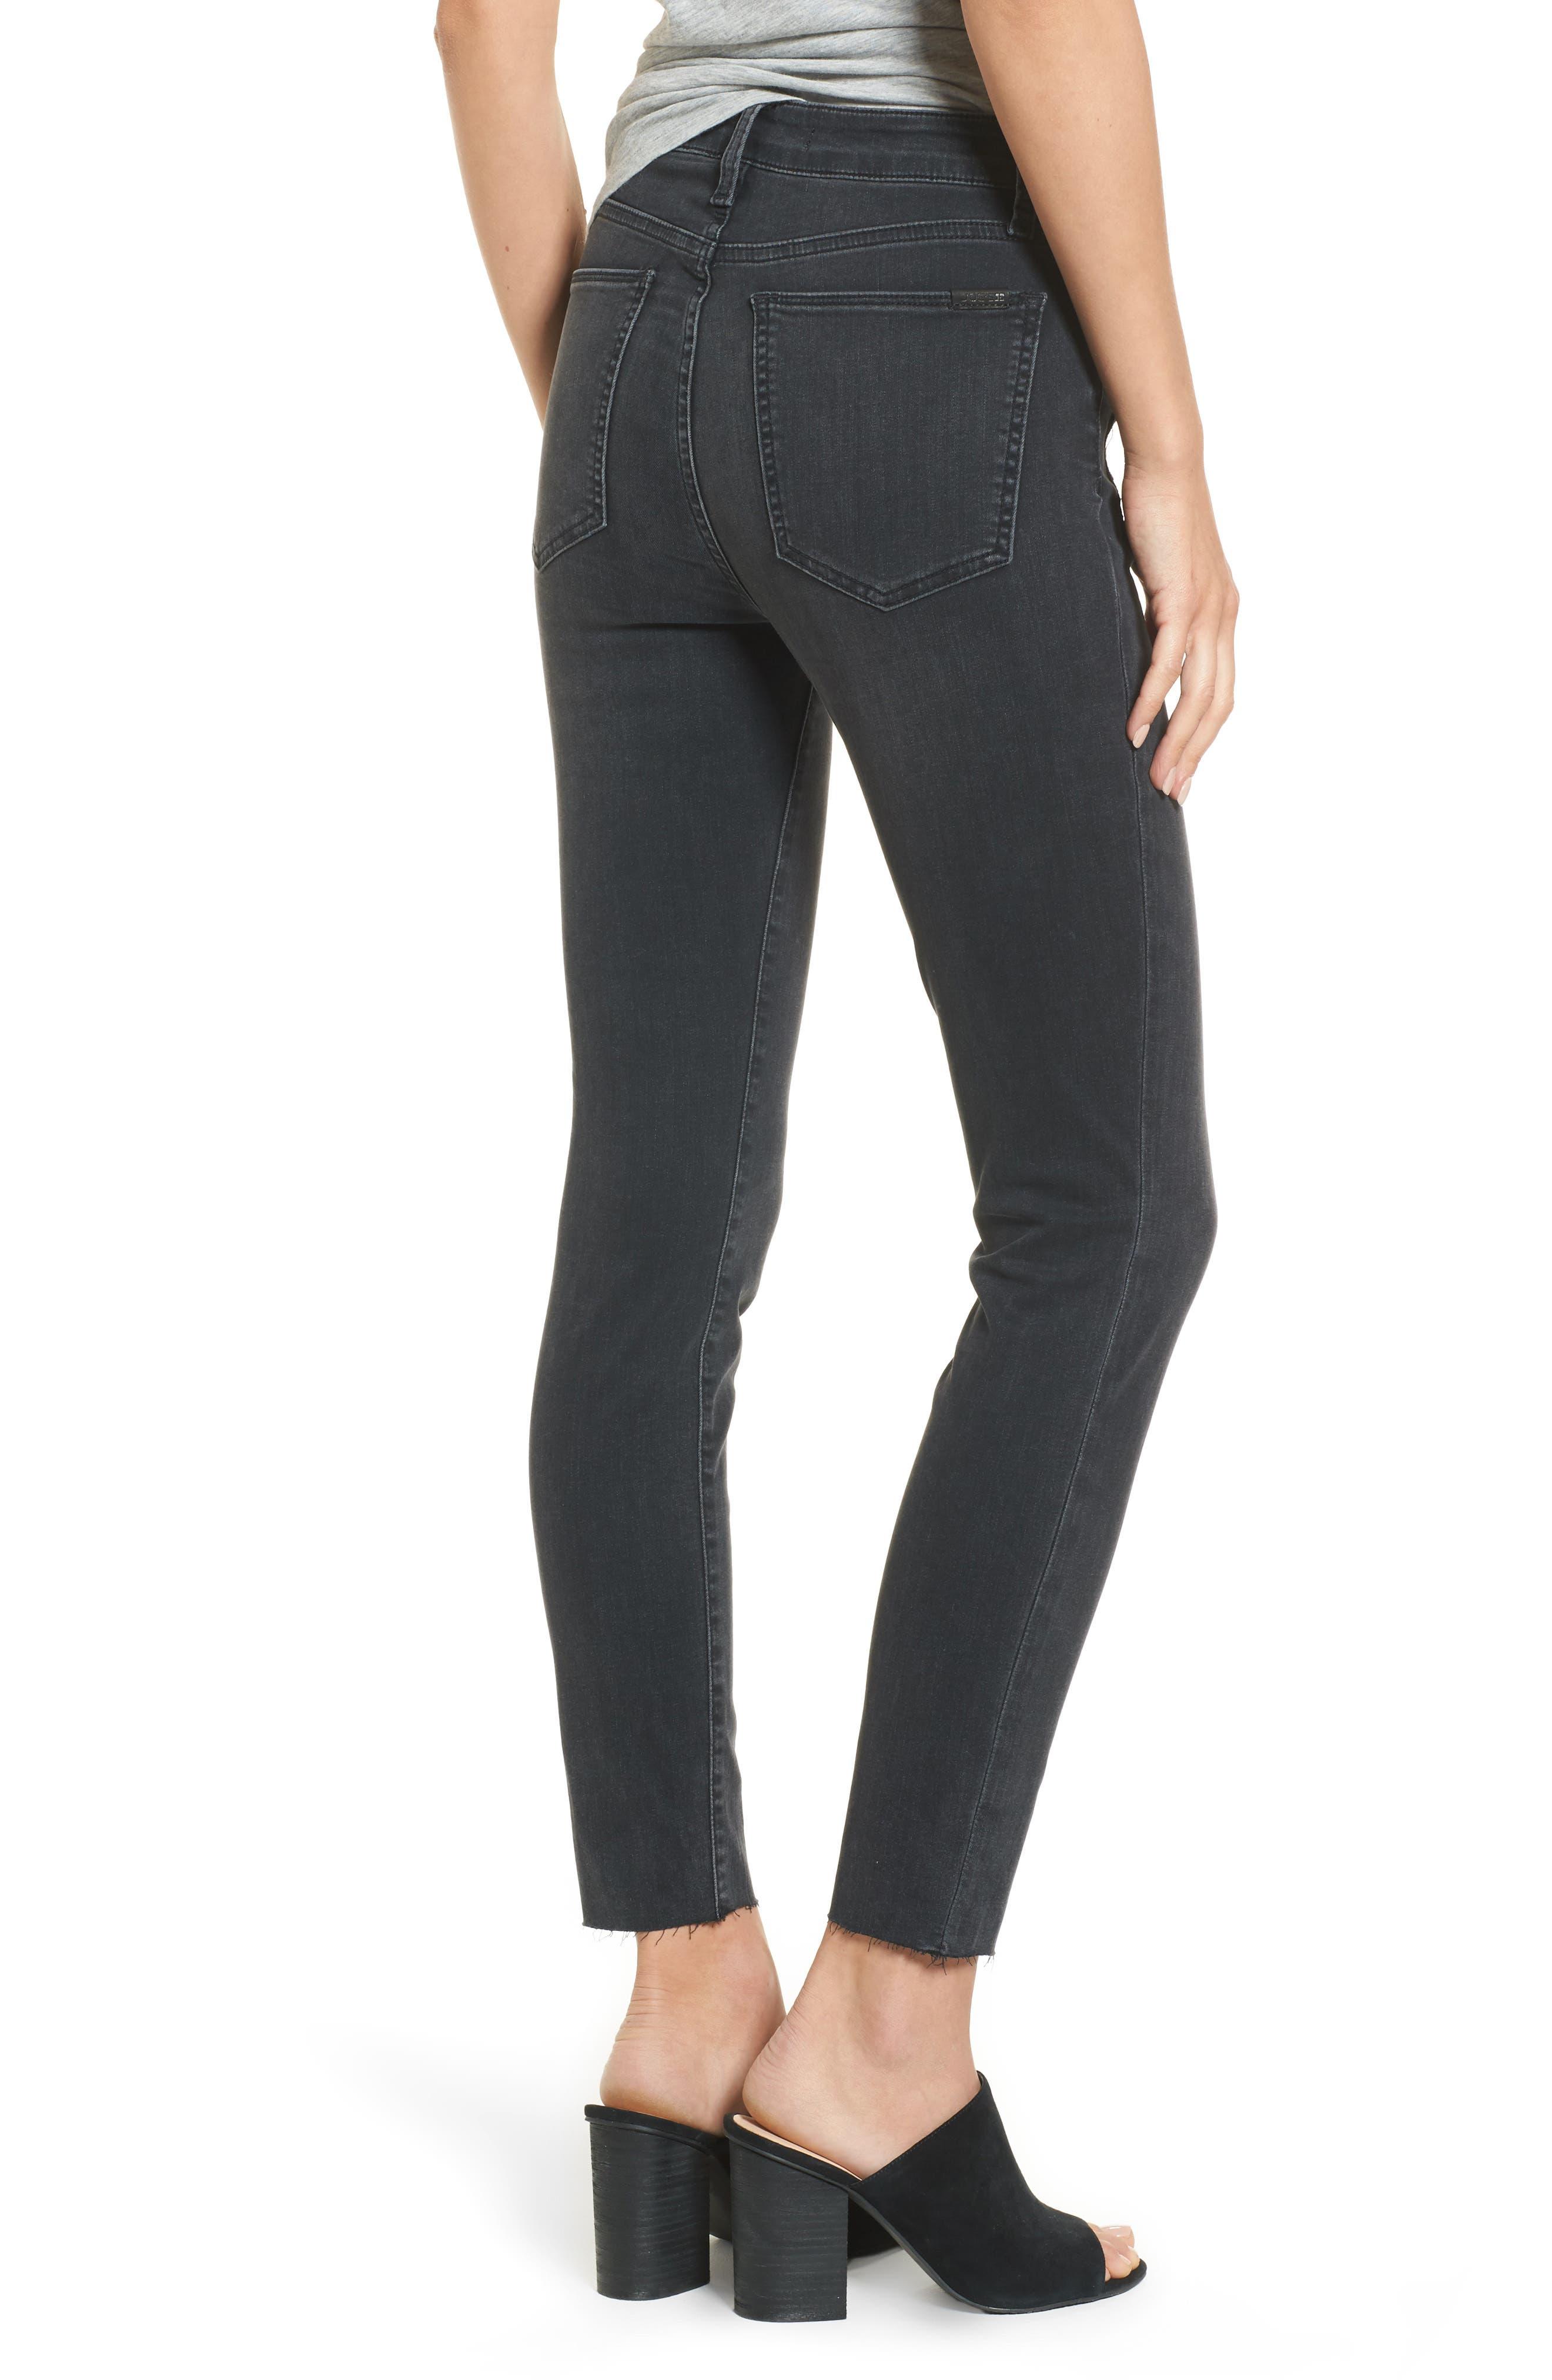 Alternate Image 2  - Joe's Charlie High Waist Ankle Skinny Jeans (Sonata)